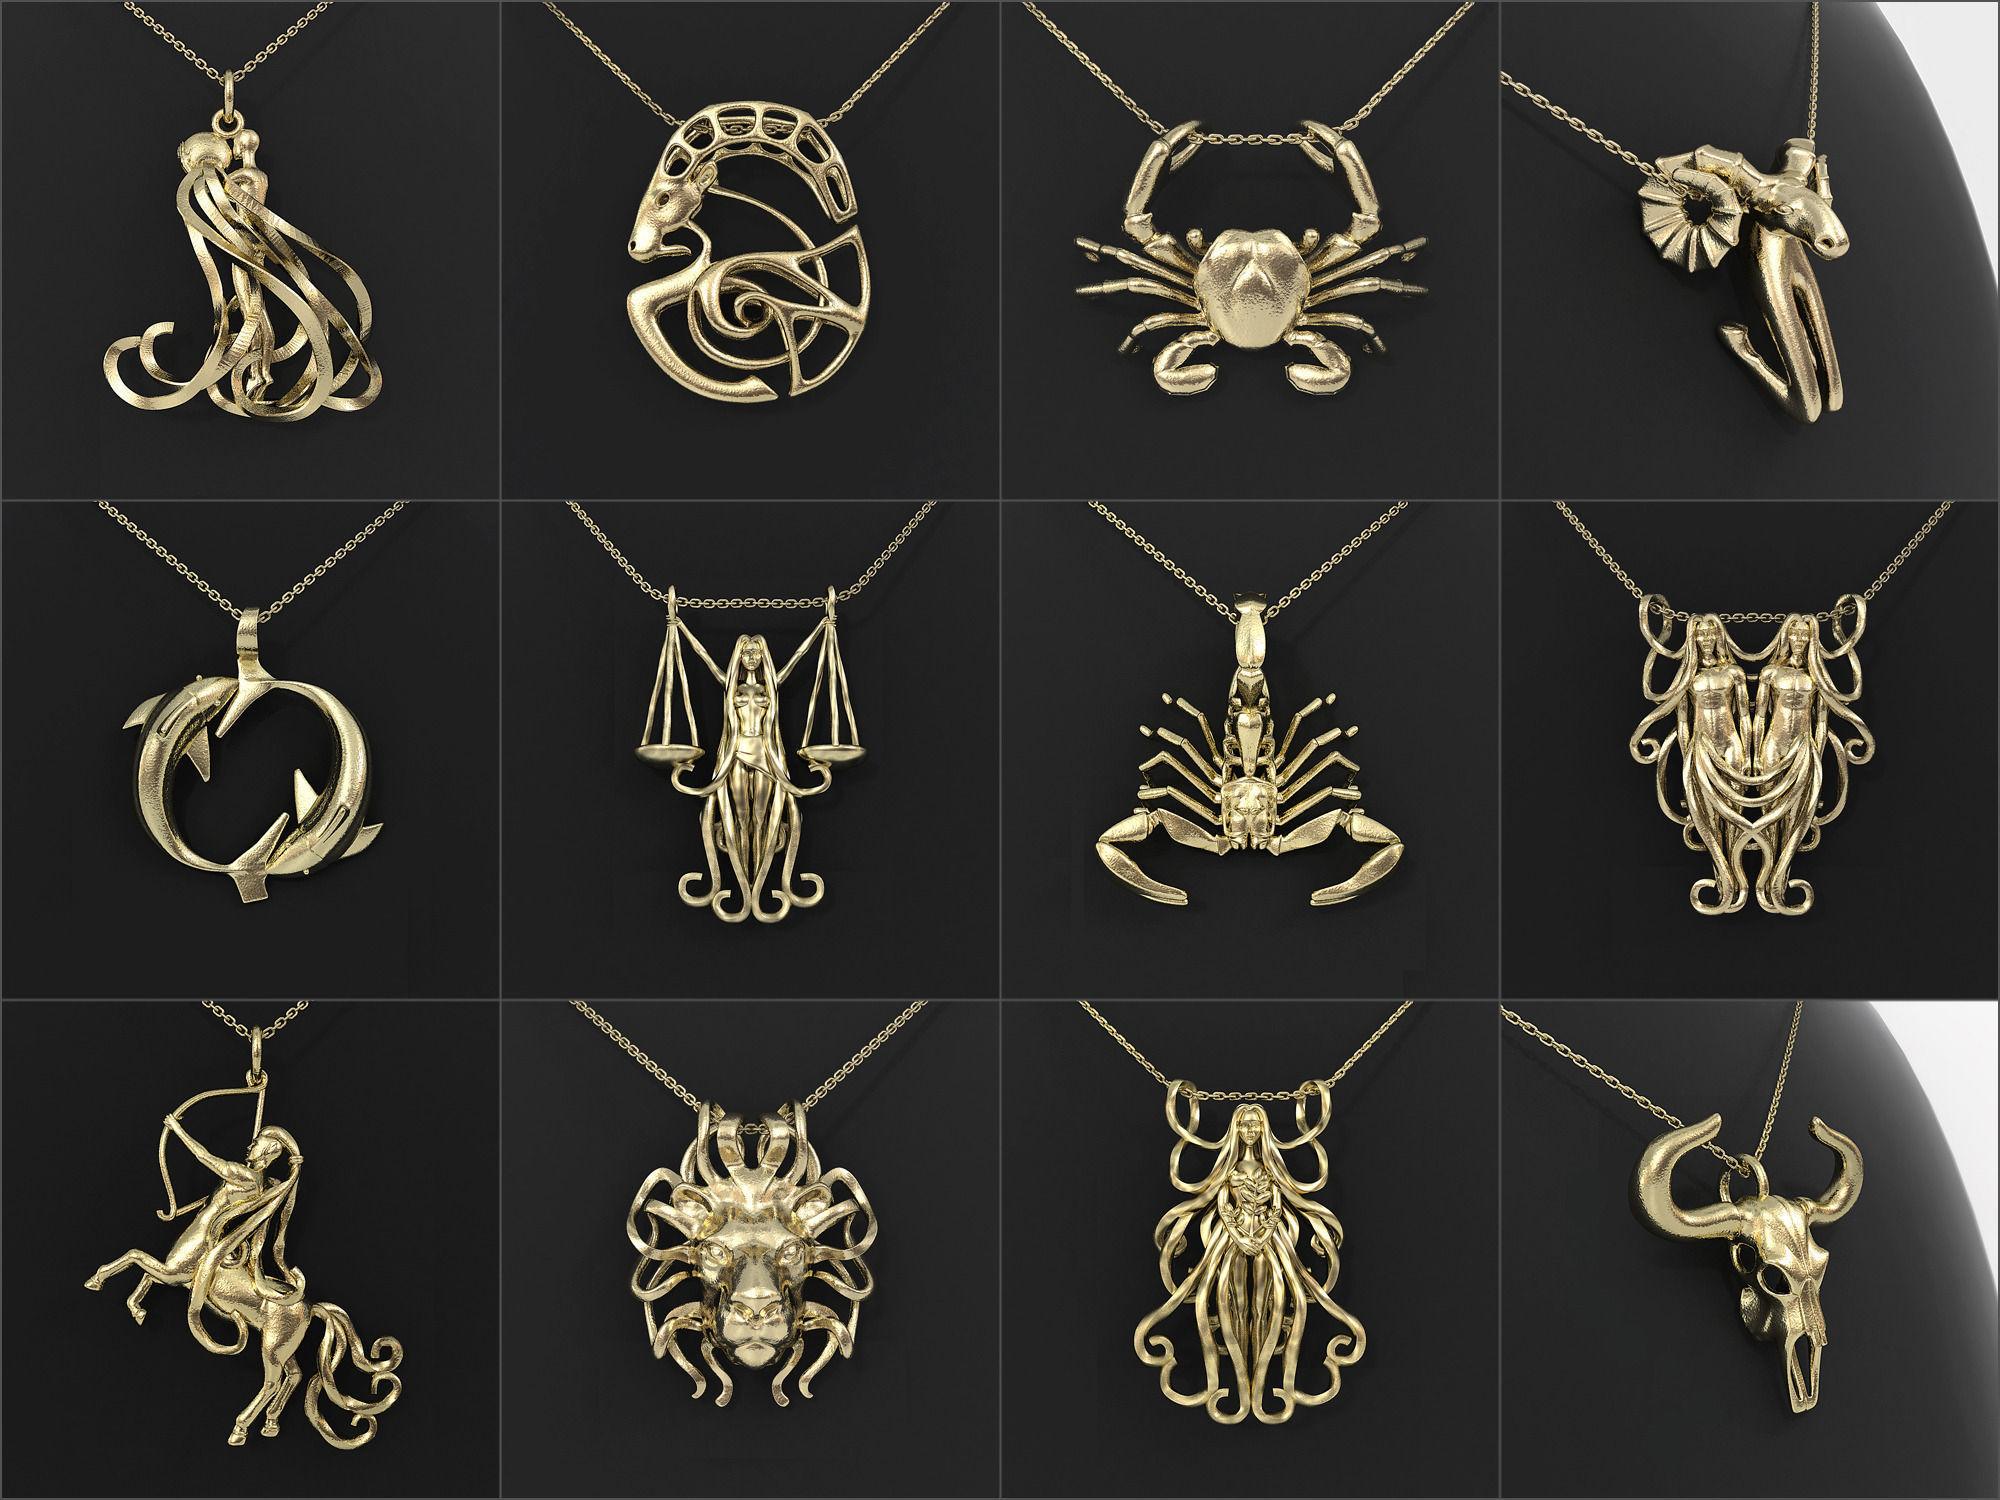 12 Zodiac Pendants Collection